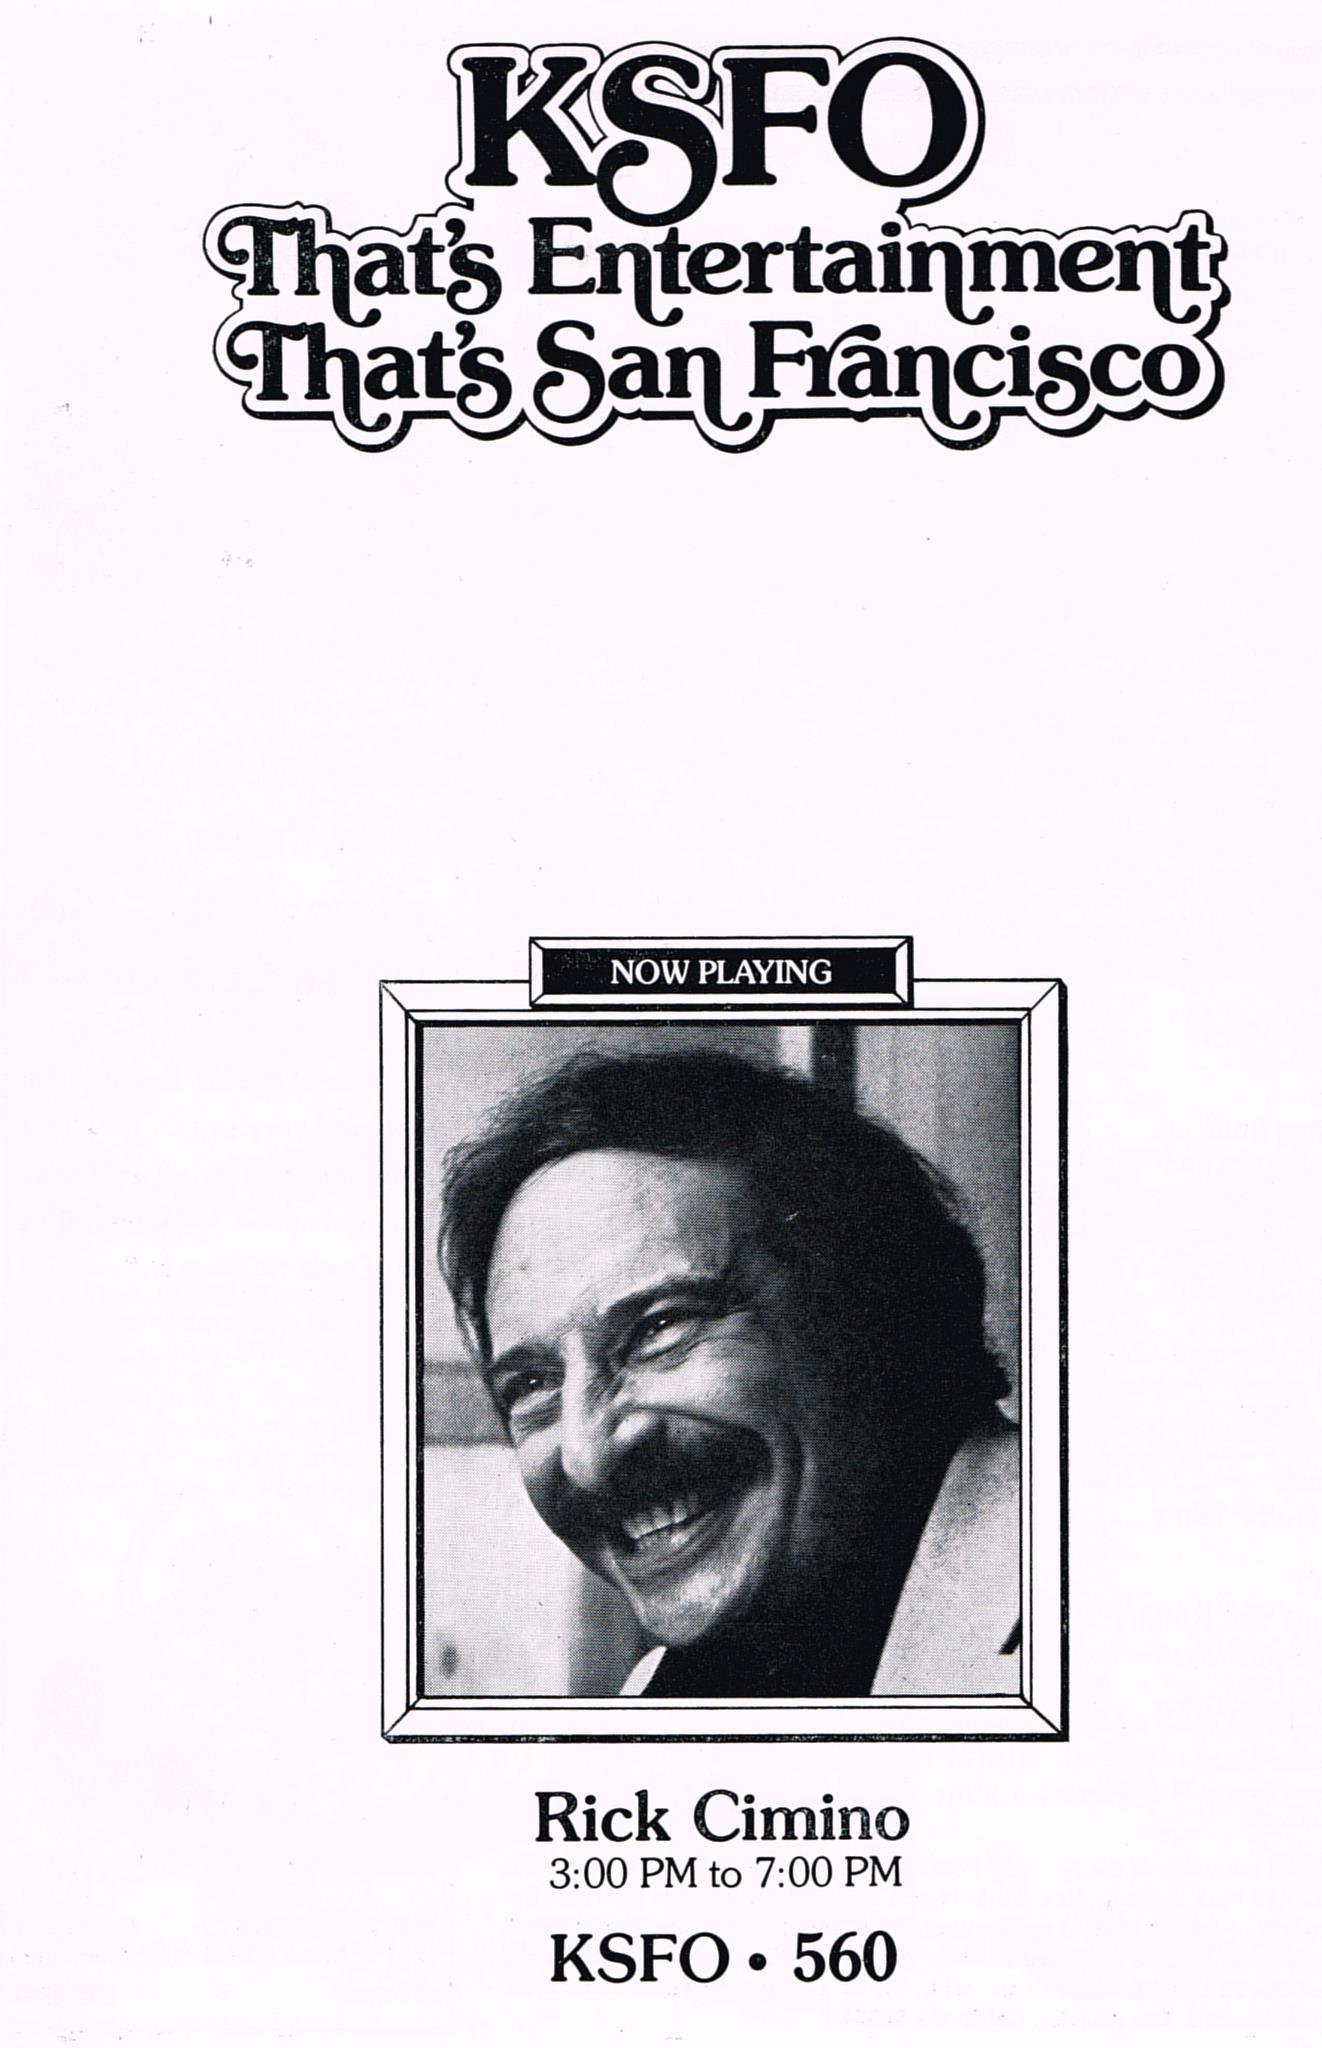 KSFO_1975_Rick-Cimino